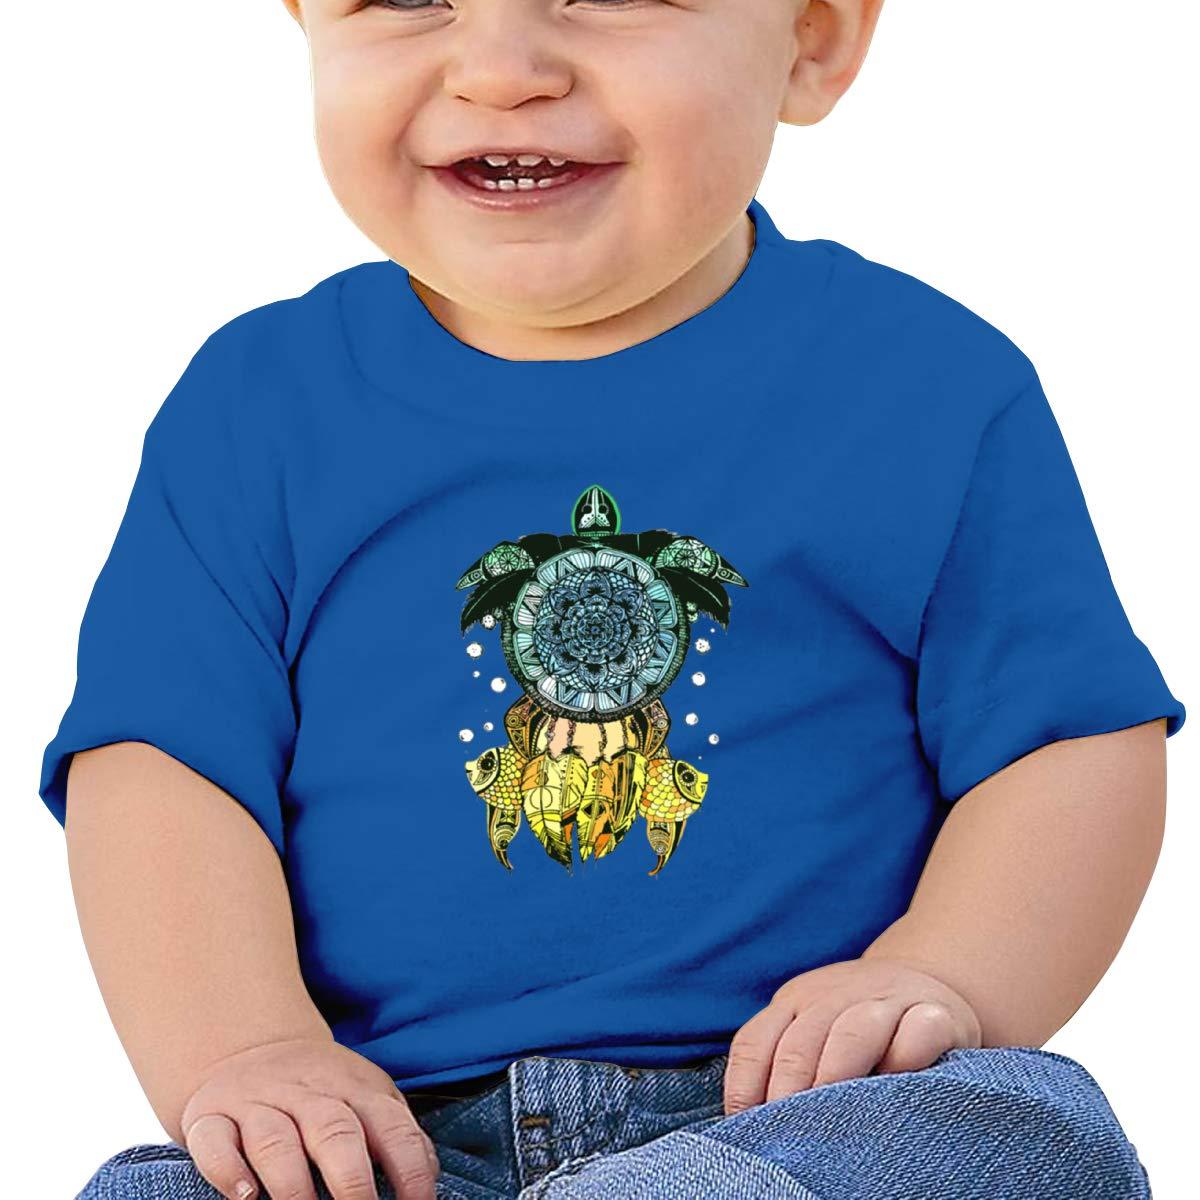 Dreamcatcher Turtle Short-Sleeve Shirts Baby Boy Toddlers